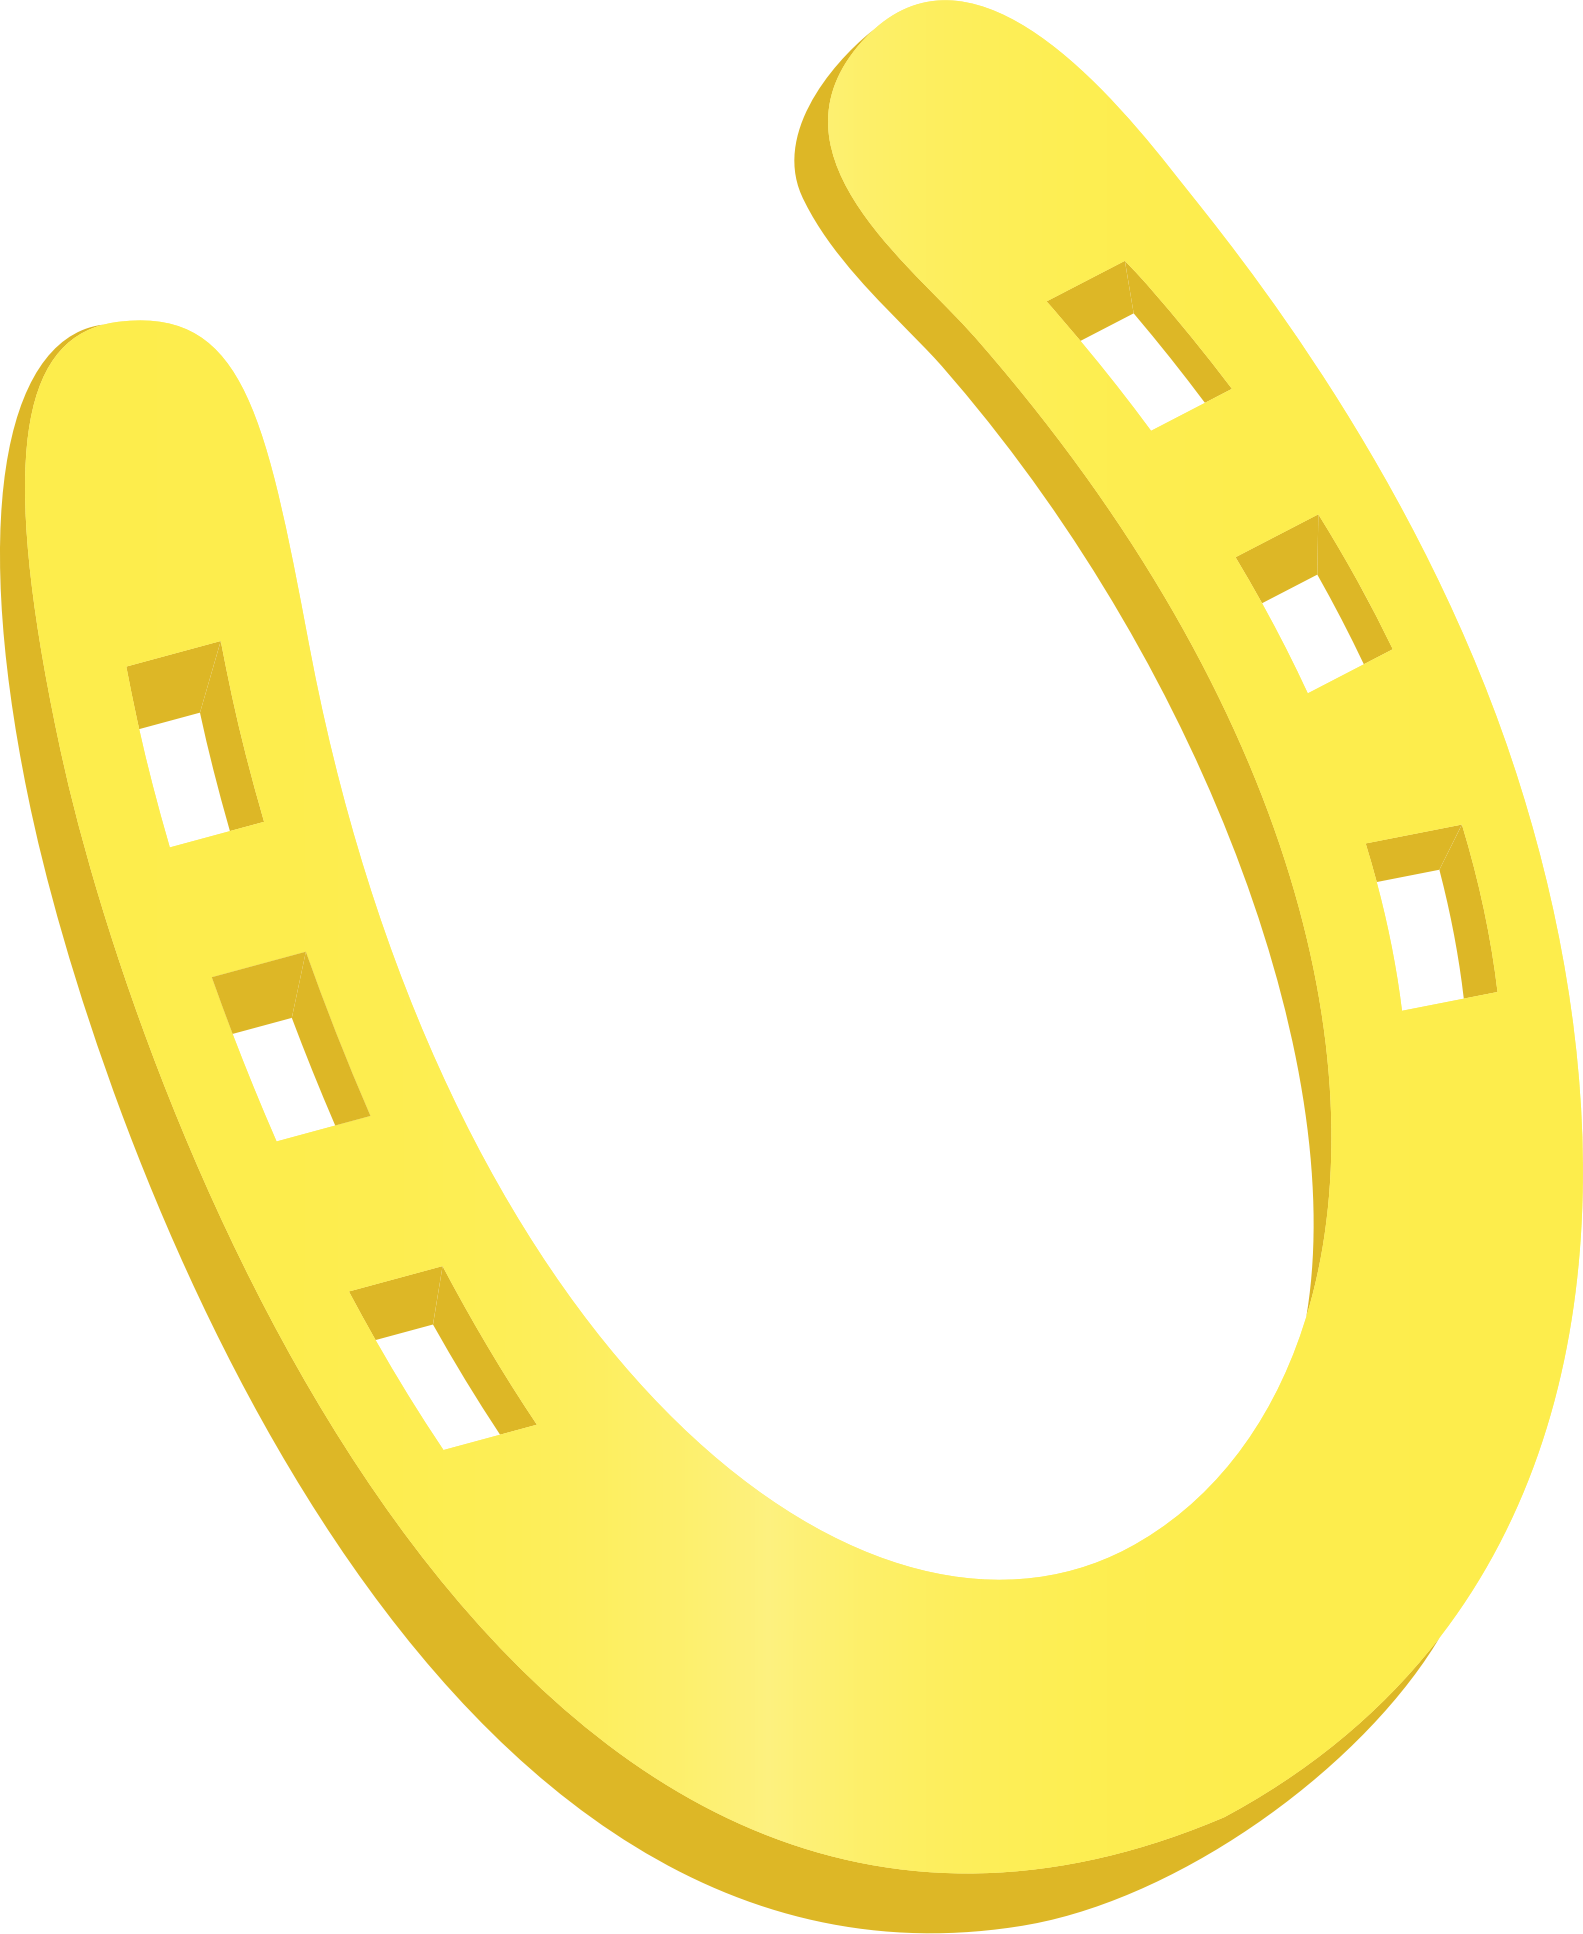 clipart horseshoe Horseshoe Silhouette Clip Art horseshoe clip art images free